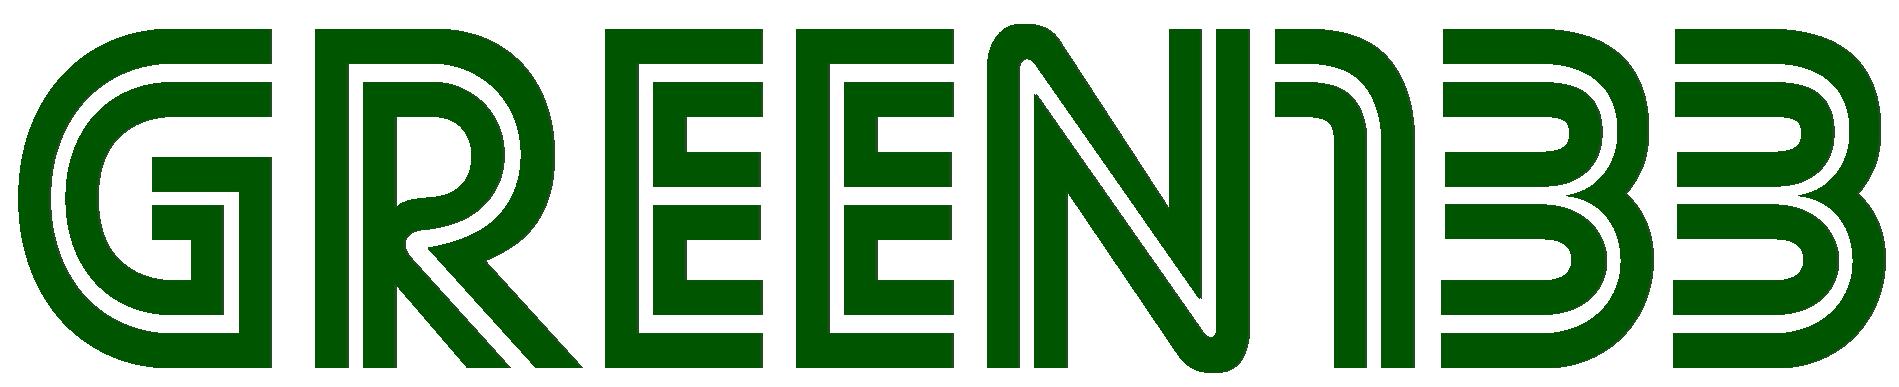 Green133